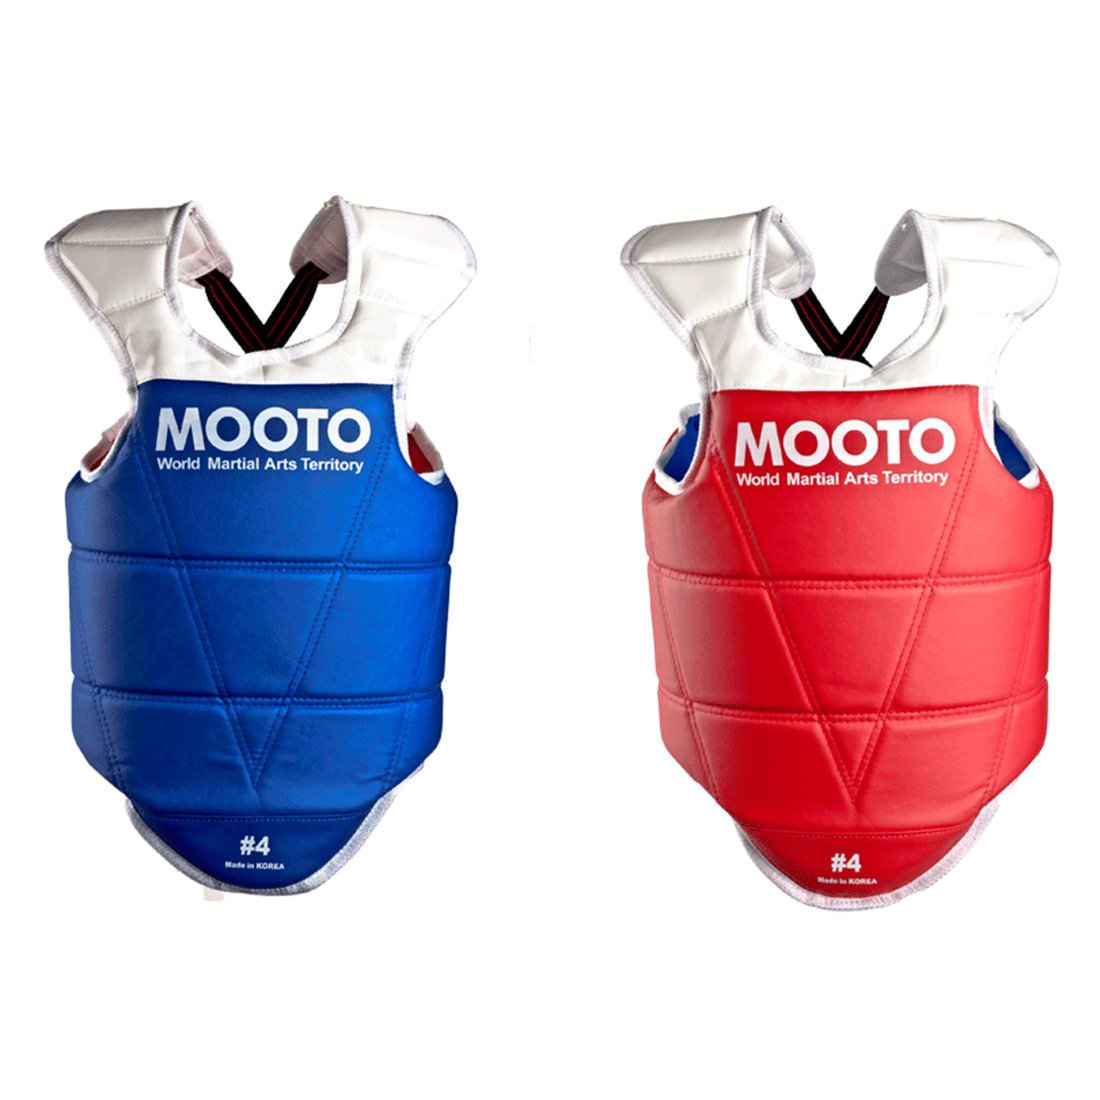 Mooto Korea Taekwondo Reversible Chest Guard Approved Protector Gear MMA TKD Martial Arts